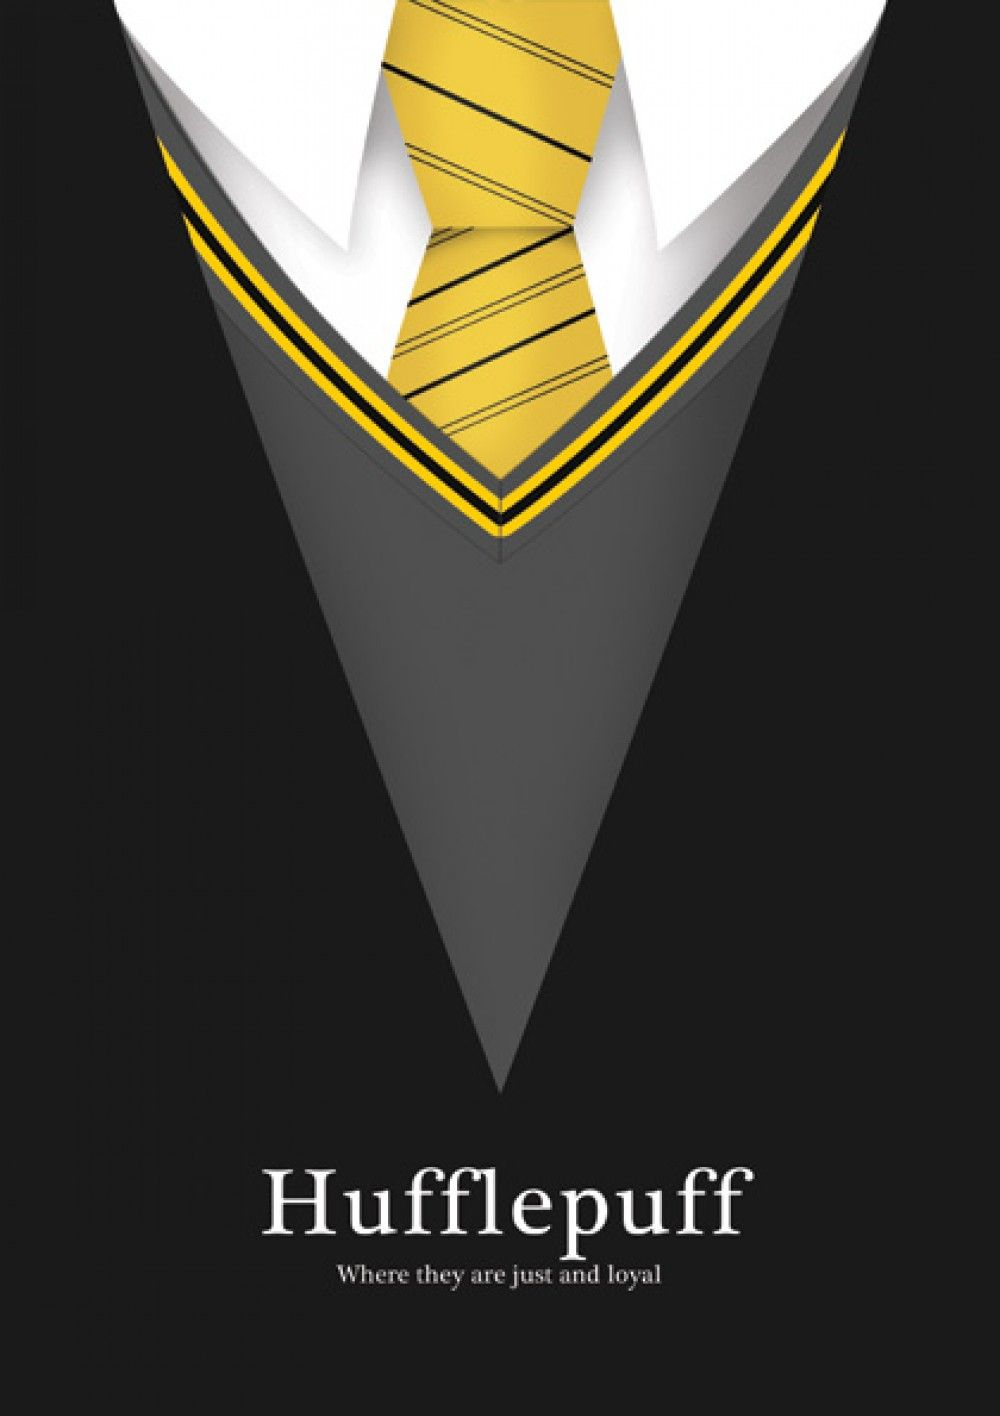 Hufflepuff Todos Posters Minimalistas Harry Potter Fondos De Pantalla Harry Potter Fondo